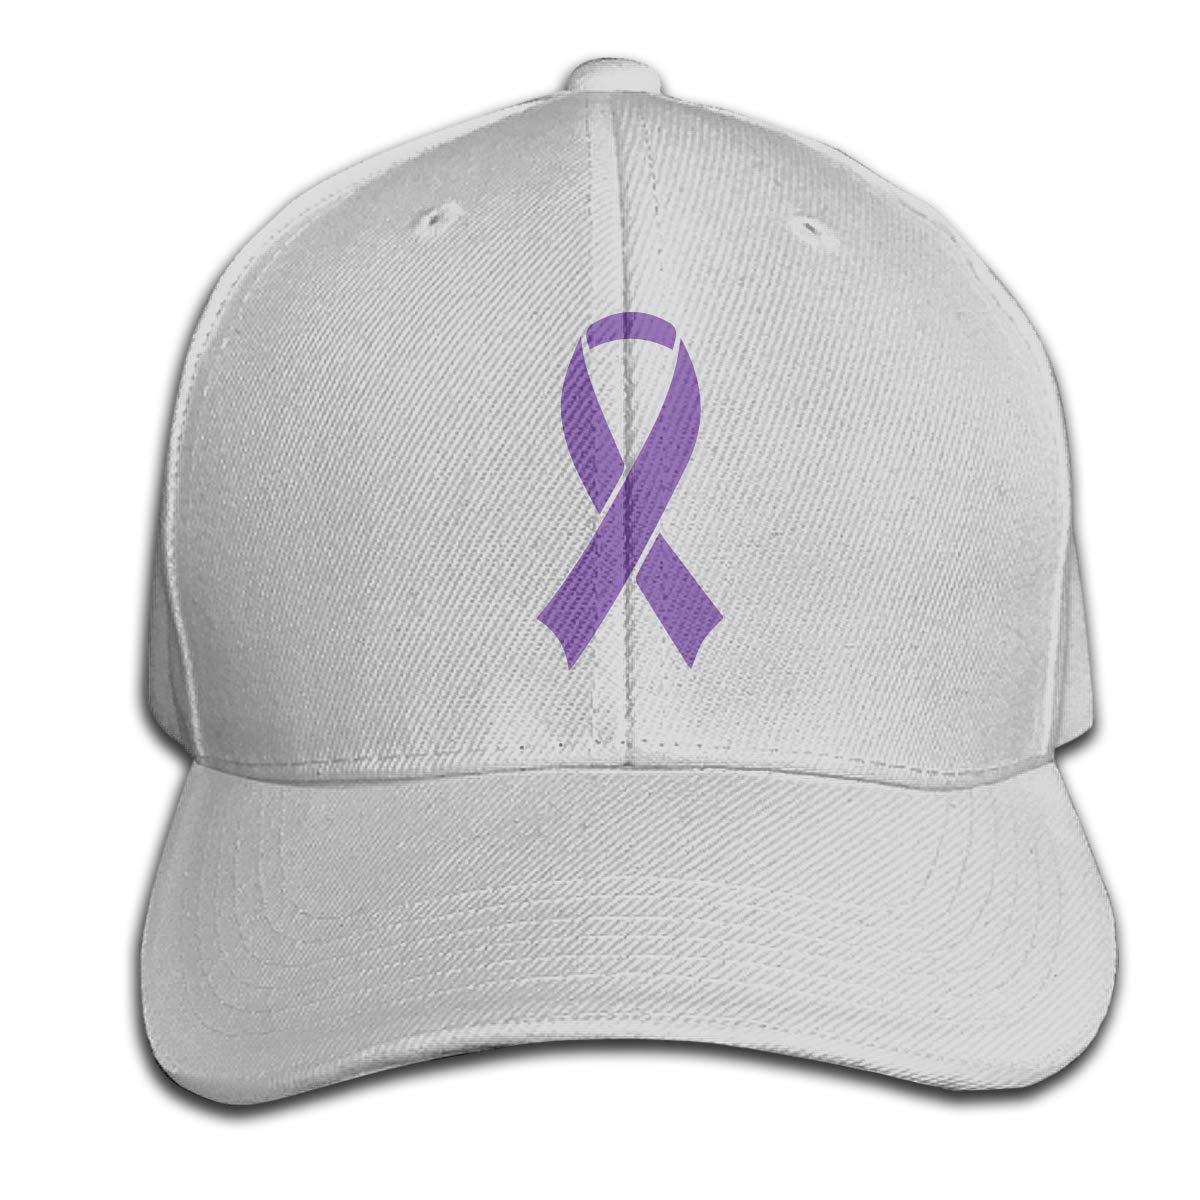 TAOHJS106 Leiomyosarcoma Cancer Awareness Ribbon Unisex Baseball Cap Adjustable Plain Hat for Women Men